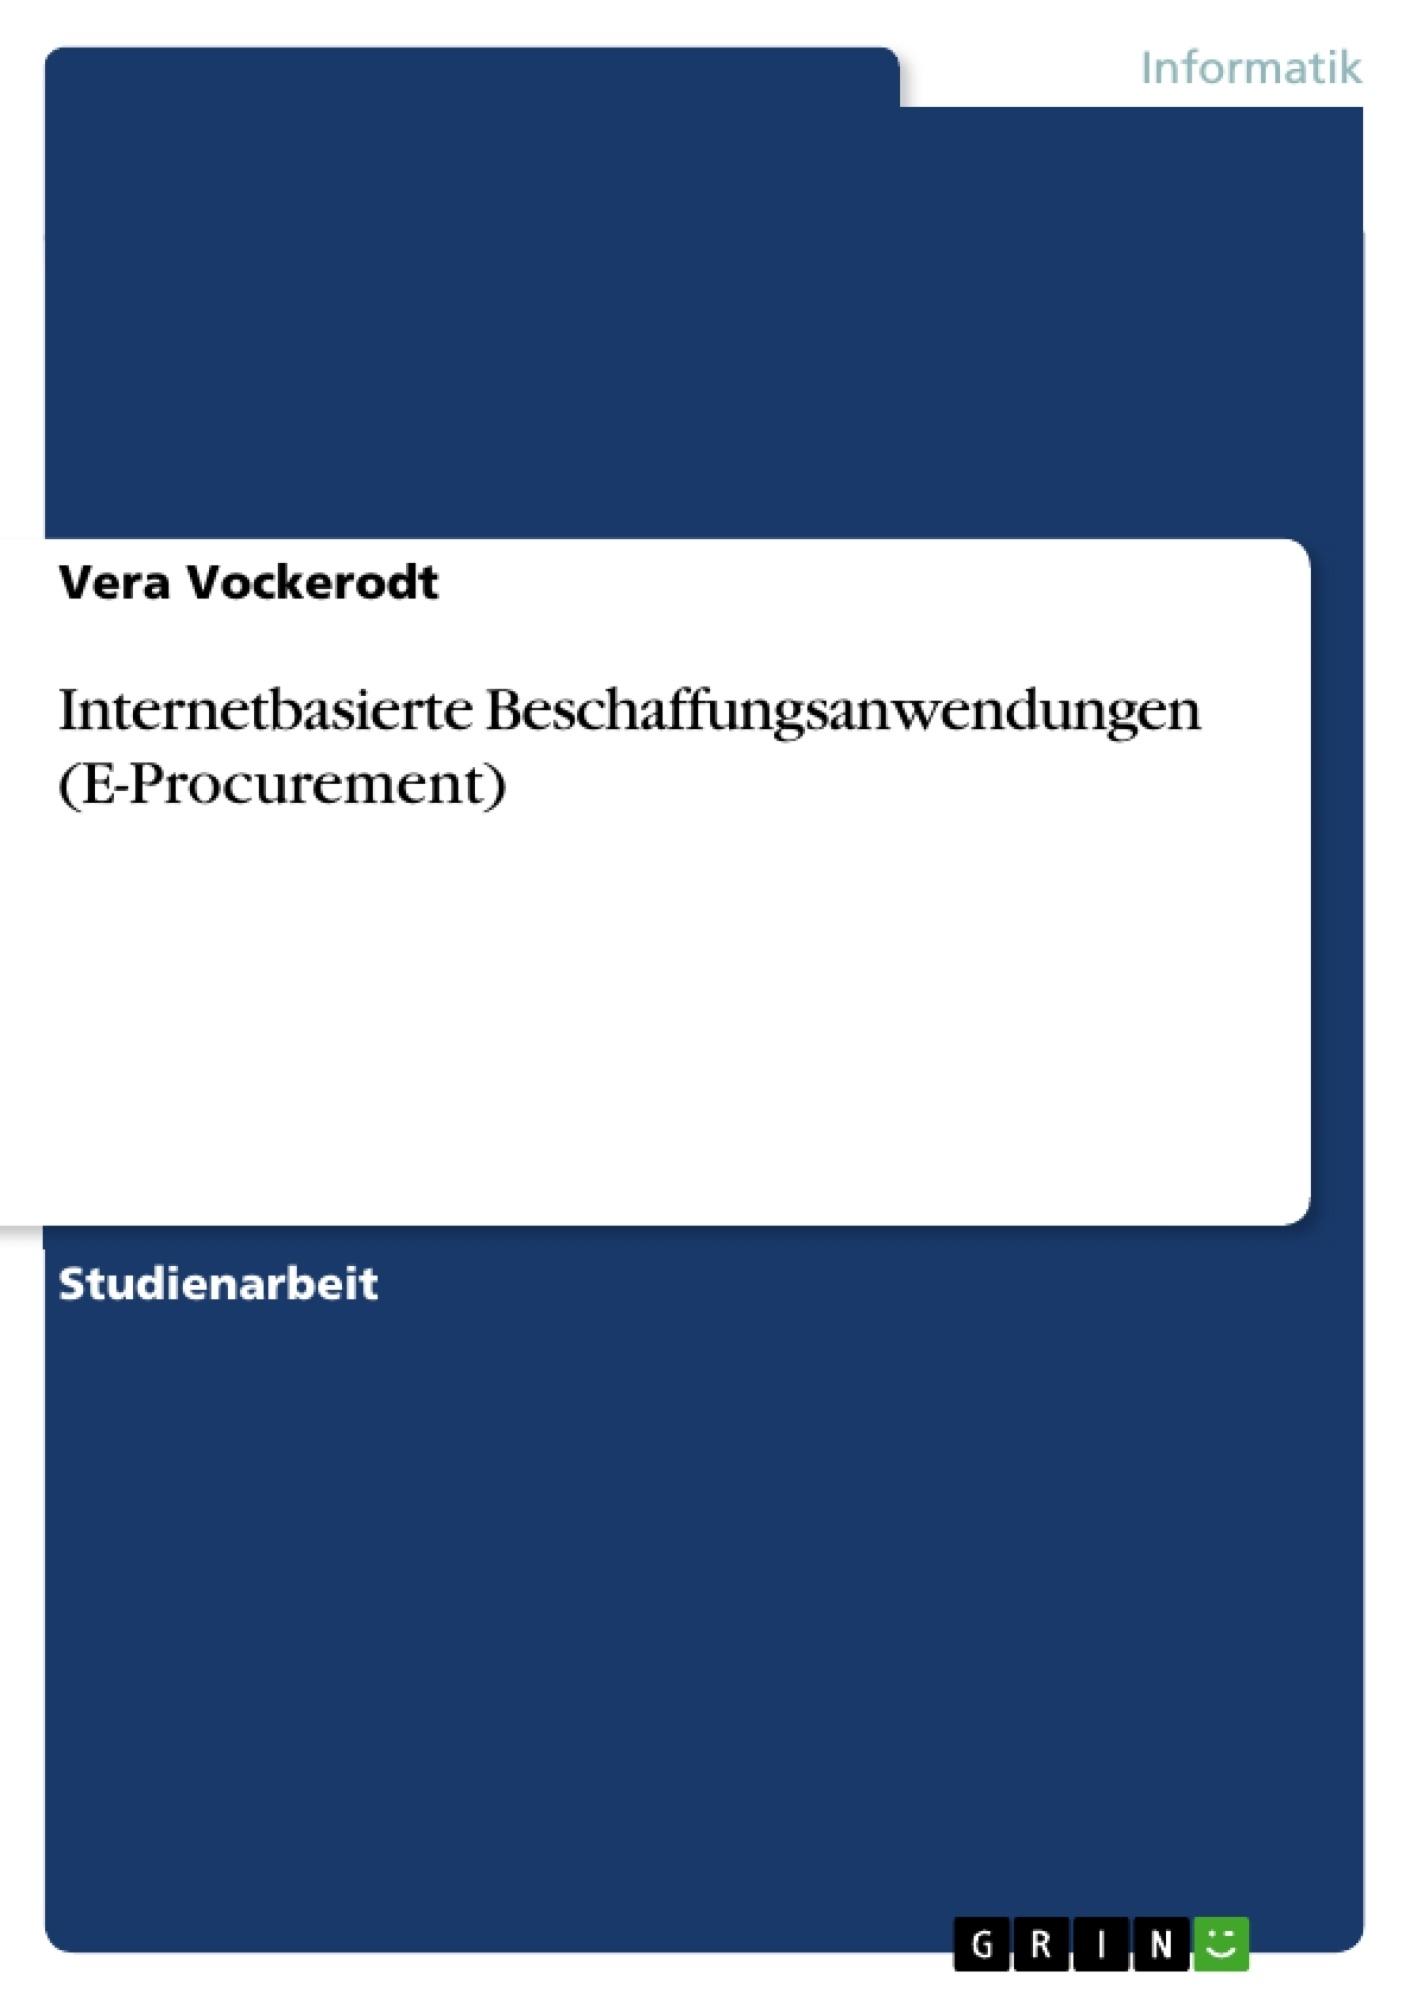 Titel: Internetbasierte Beschaffungsanwendungen (E-Procurement)